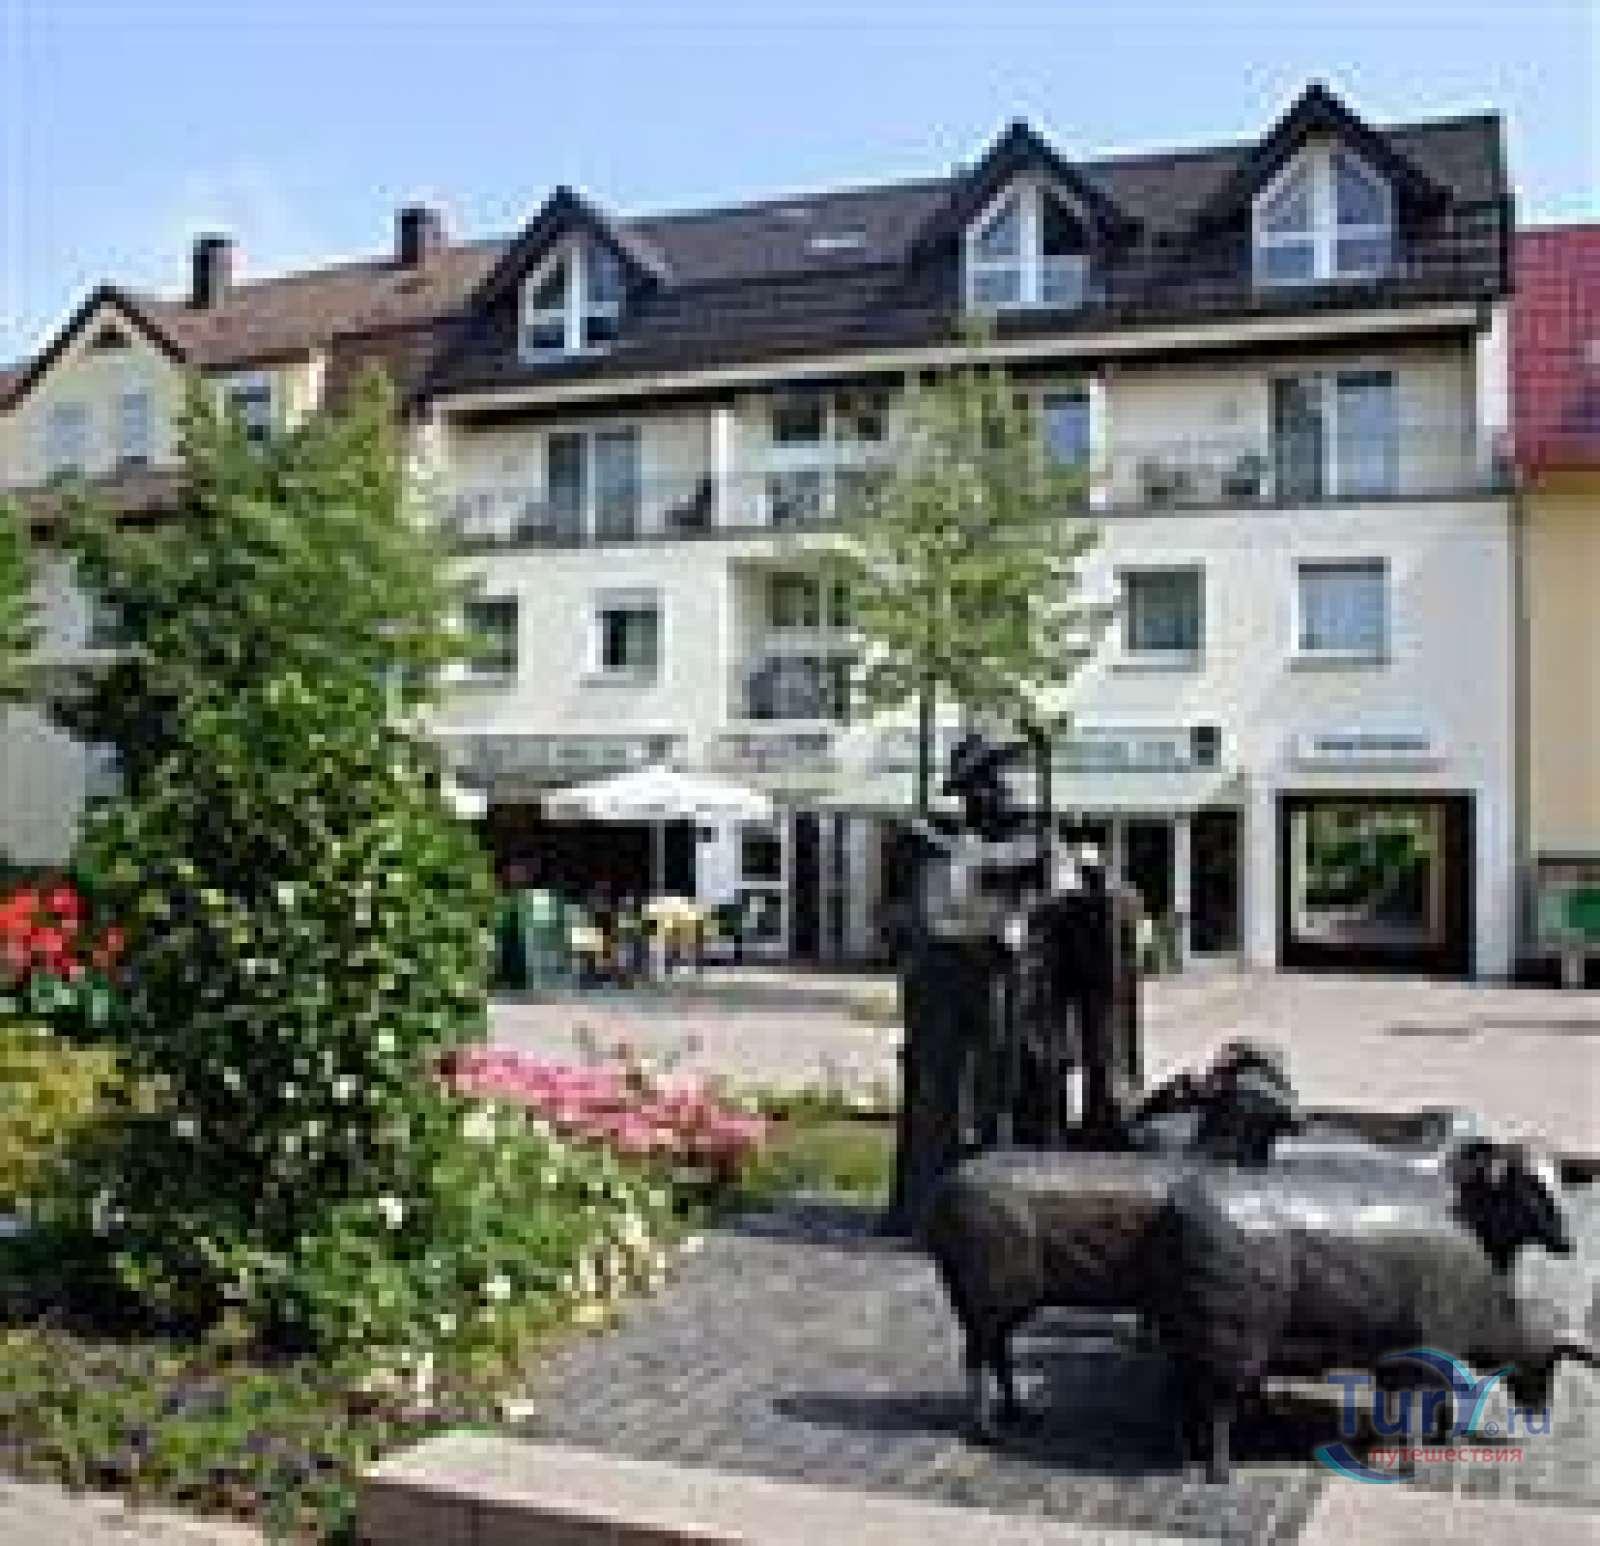 Full Size of Hotel Schaferbrunnen Bad Lippspringe 3 Griesbach Fußboden Muskau Sassendorf Lampen Led Badezimmer Komplett Tölz Und Sanitär Honnef Armaturen Breaking T Bad Bad Lippspringe Hotel